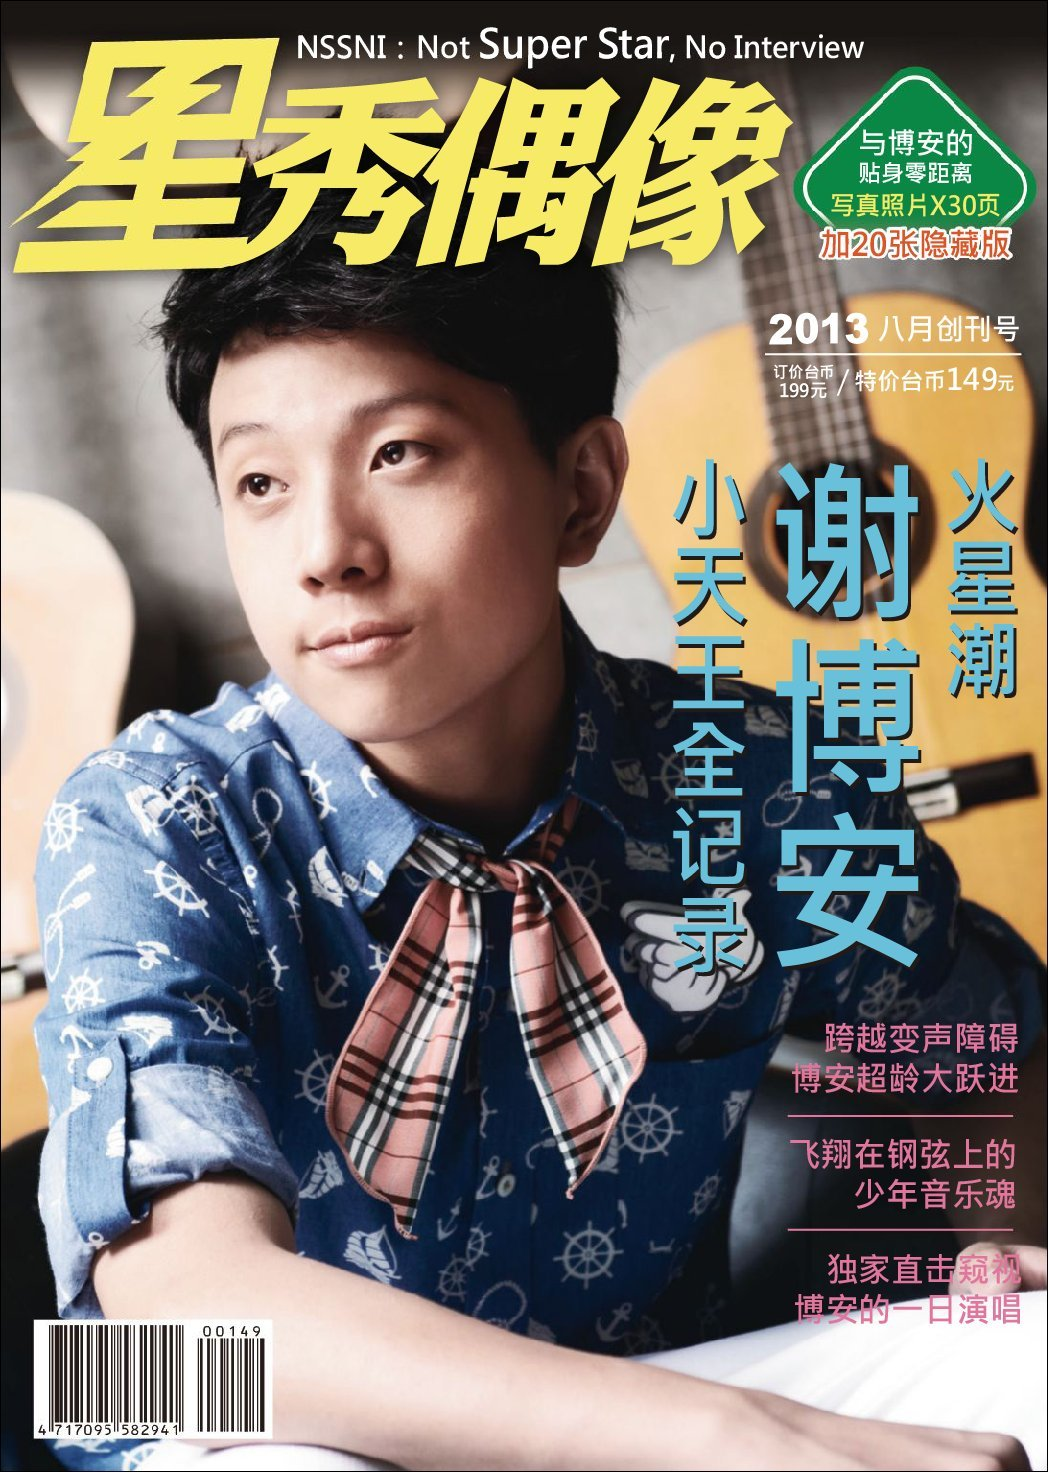 Super Star Simple Chinese version 星秀偶像杂志 简体版 (Digital)